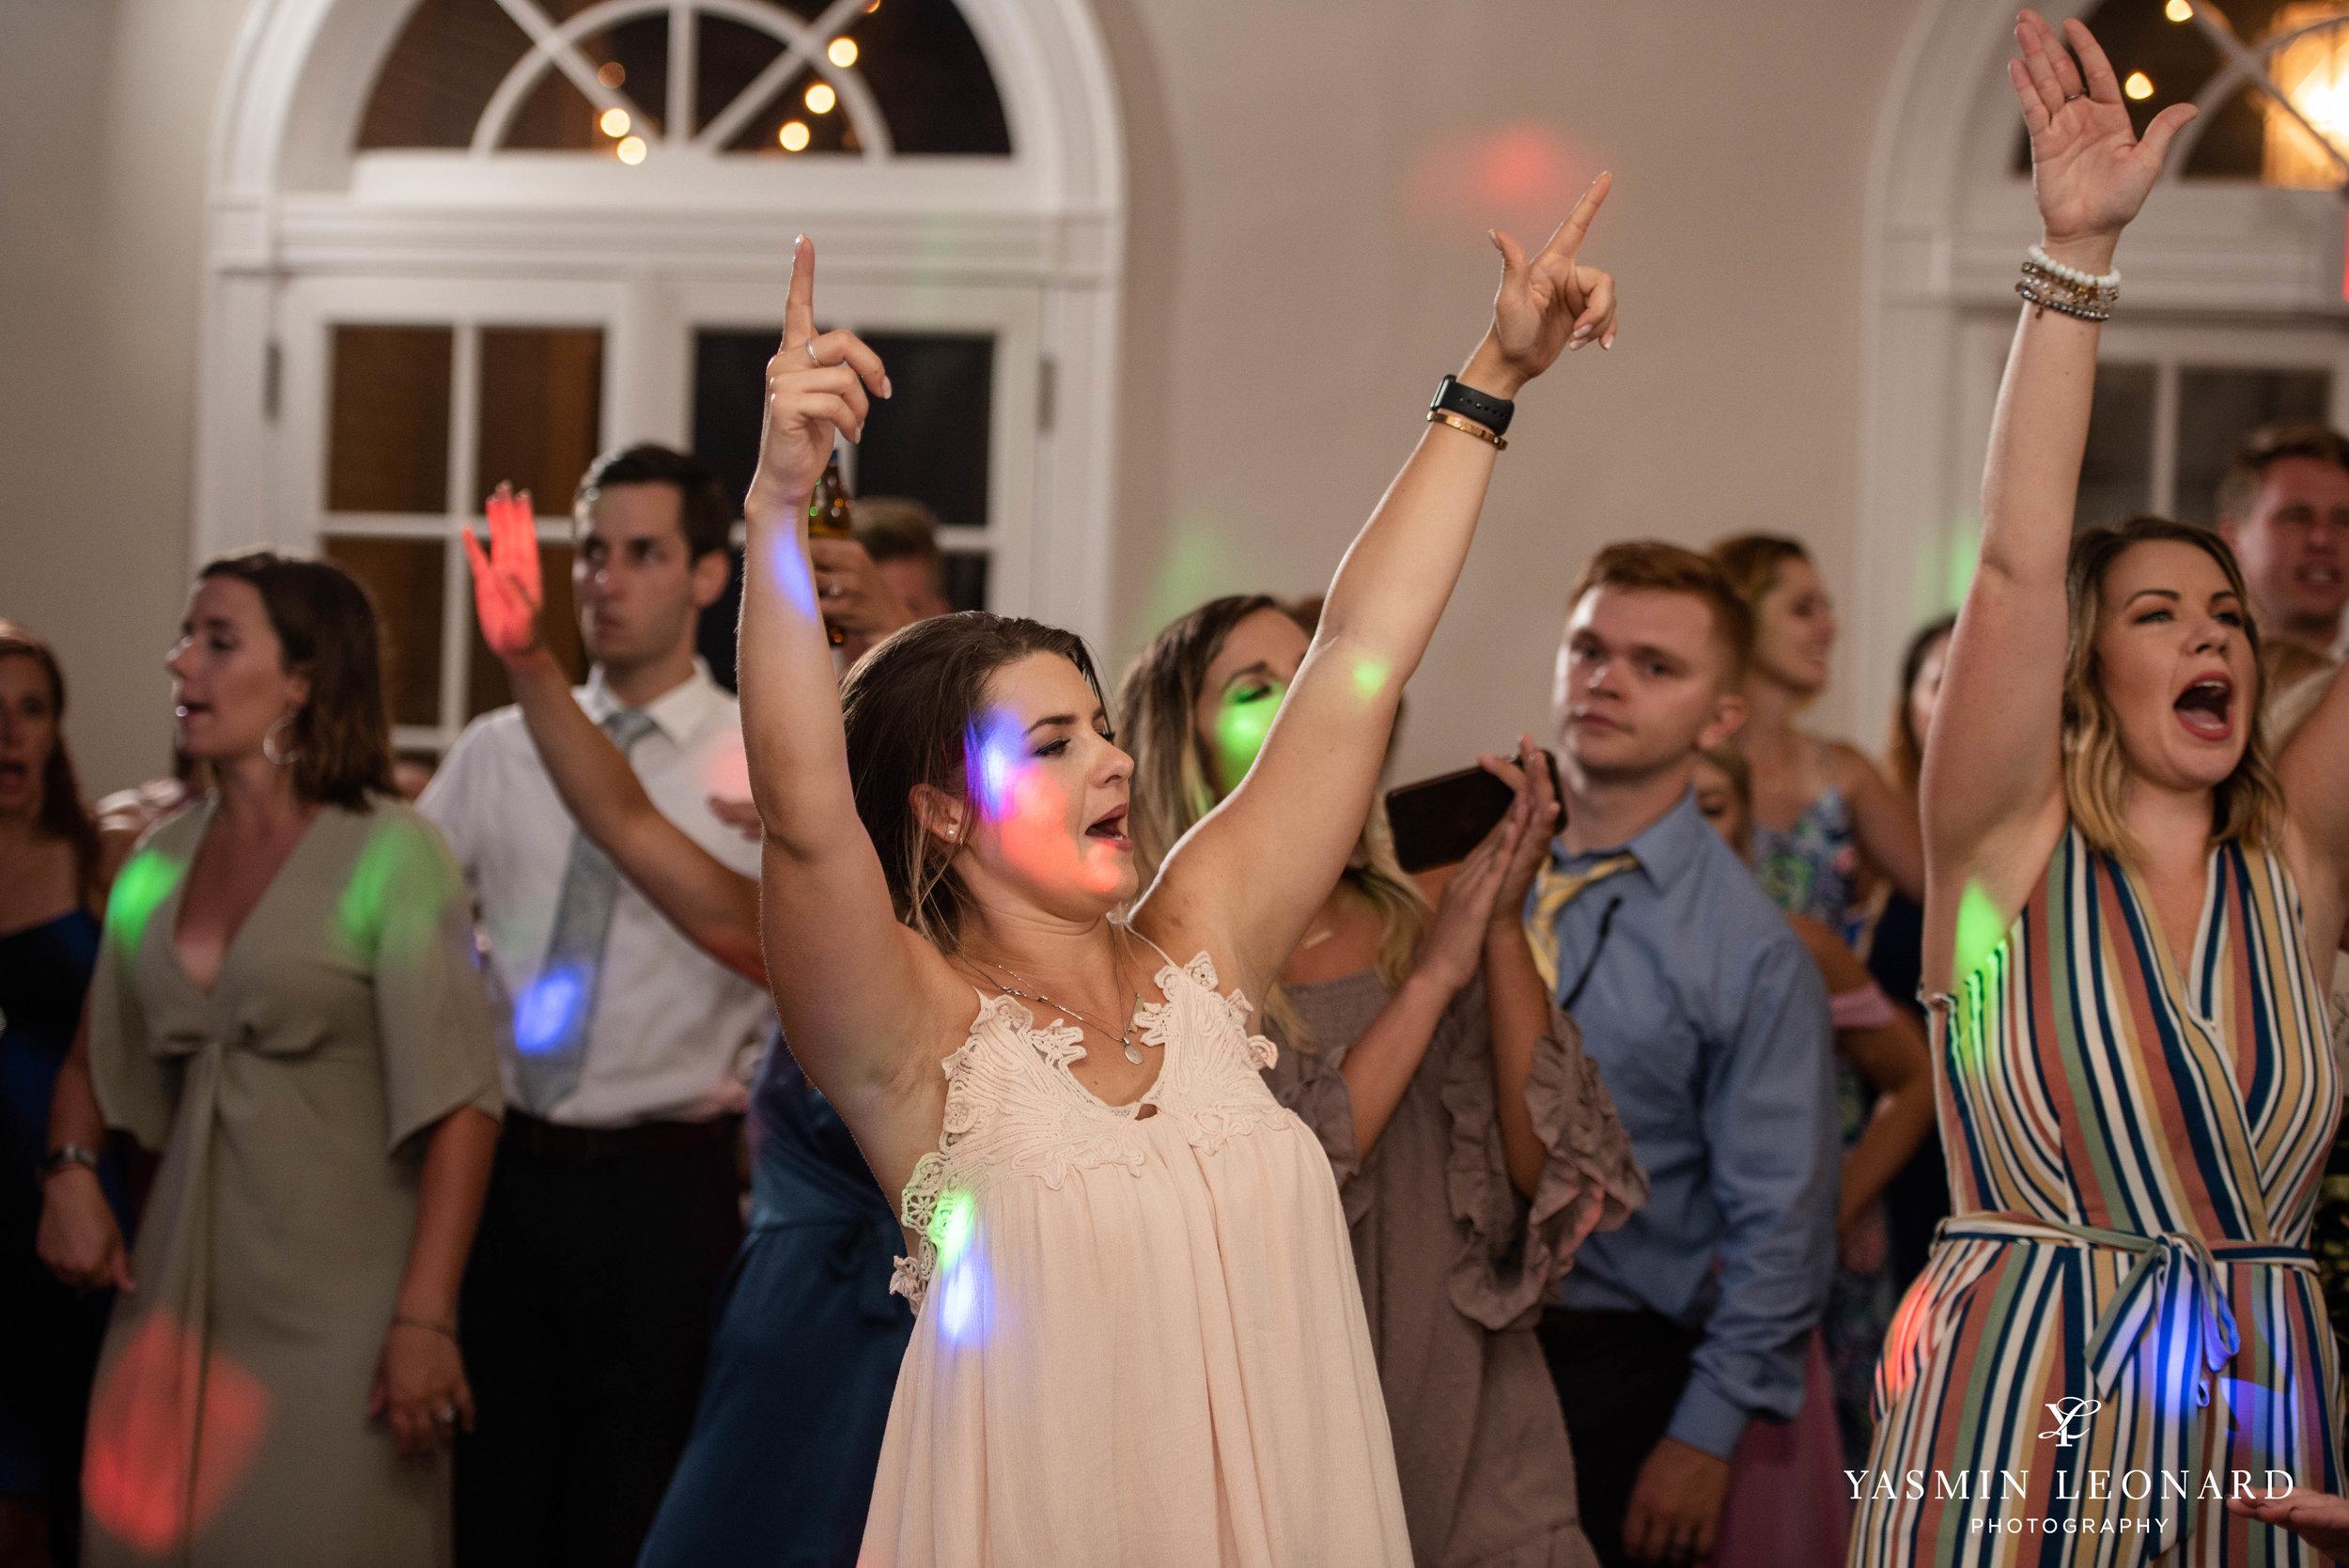 Separk Mansion - NC Weddings - Gastonia Wedding - NC Wedding Venues - Pink and Blue Wedding Ideas - Pink Bridesmaid Dresses - Yasmin Leonard Photography-70.jpg